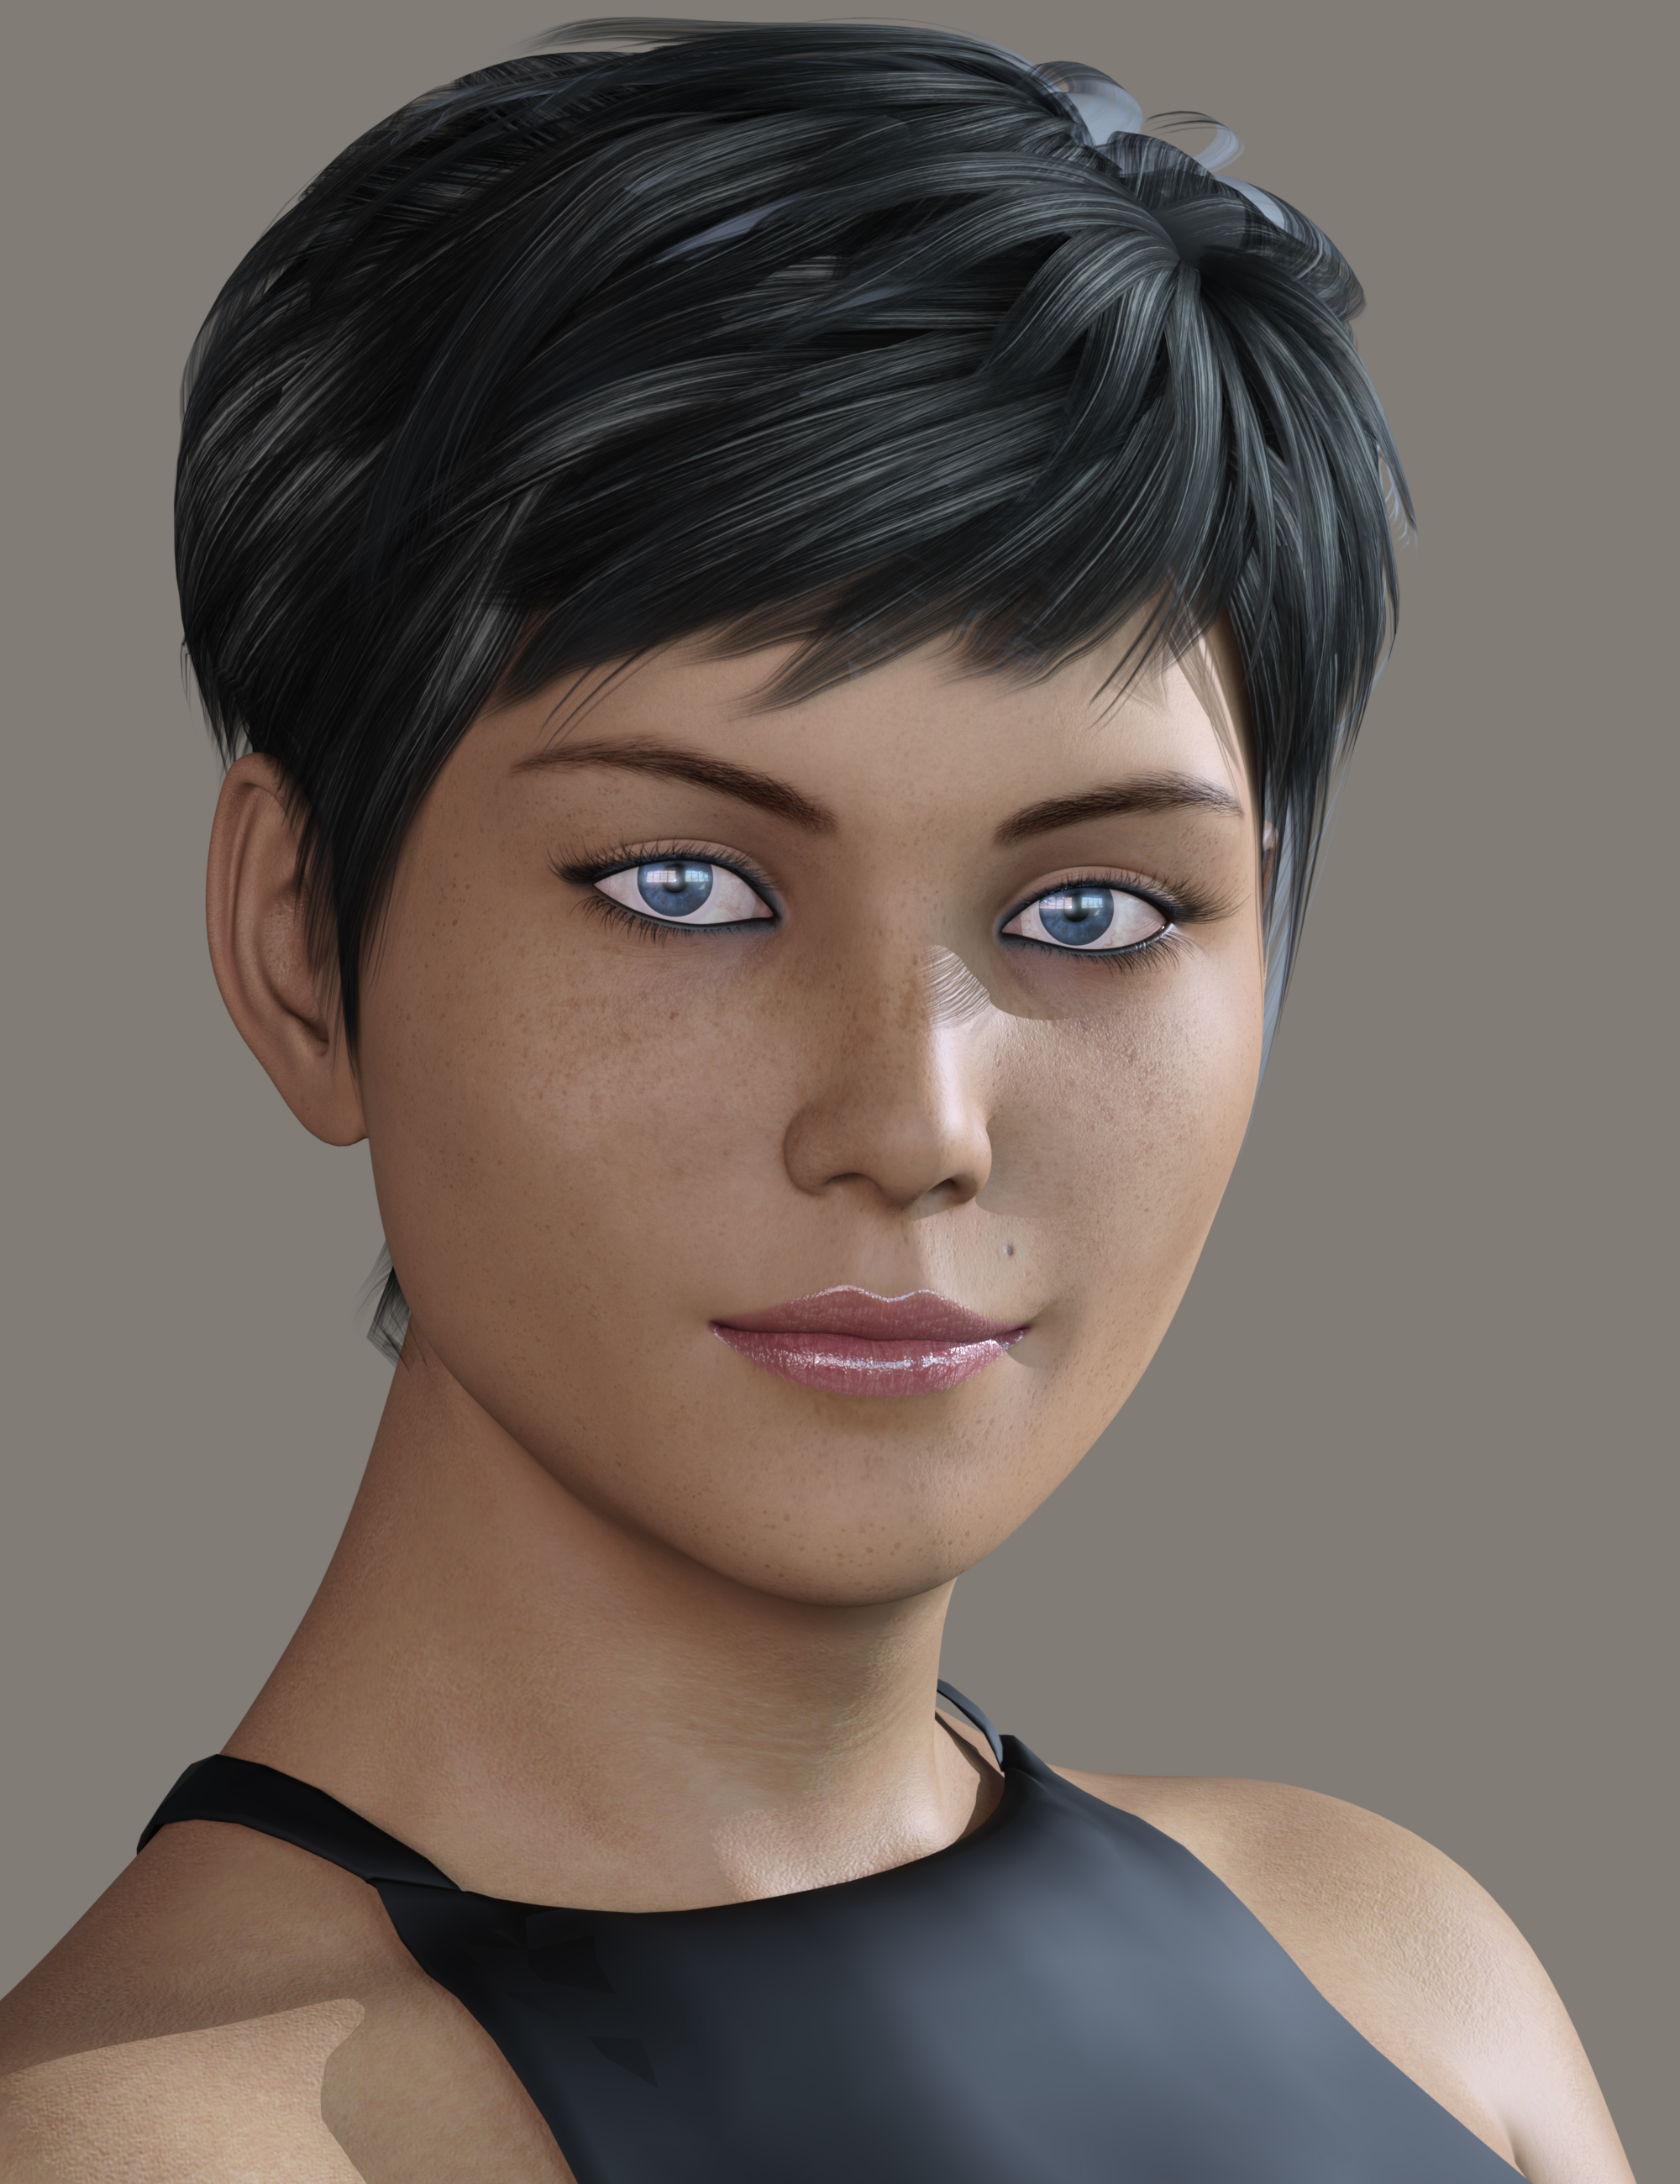 DE Deanna for Genesis 8 Female by: Dark-Elf, 3D Models by Daz 3D